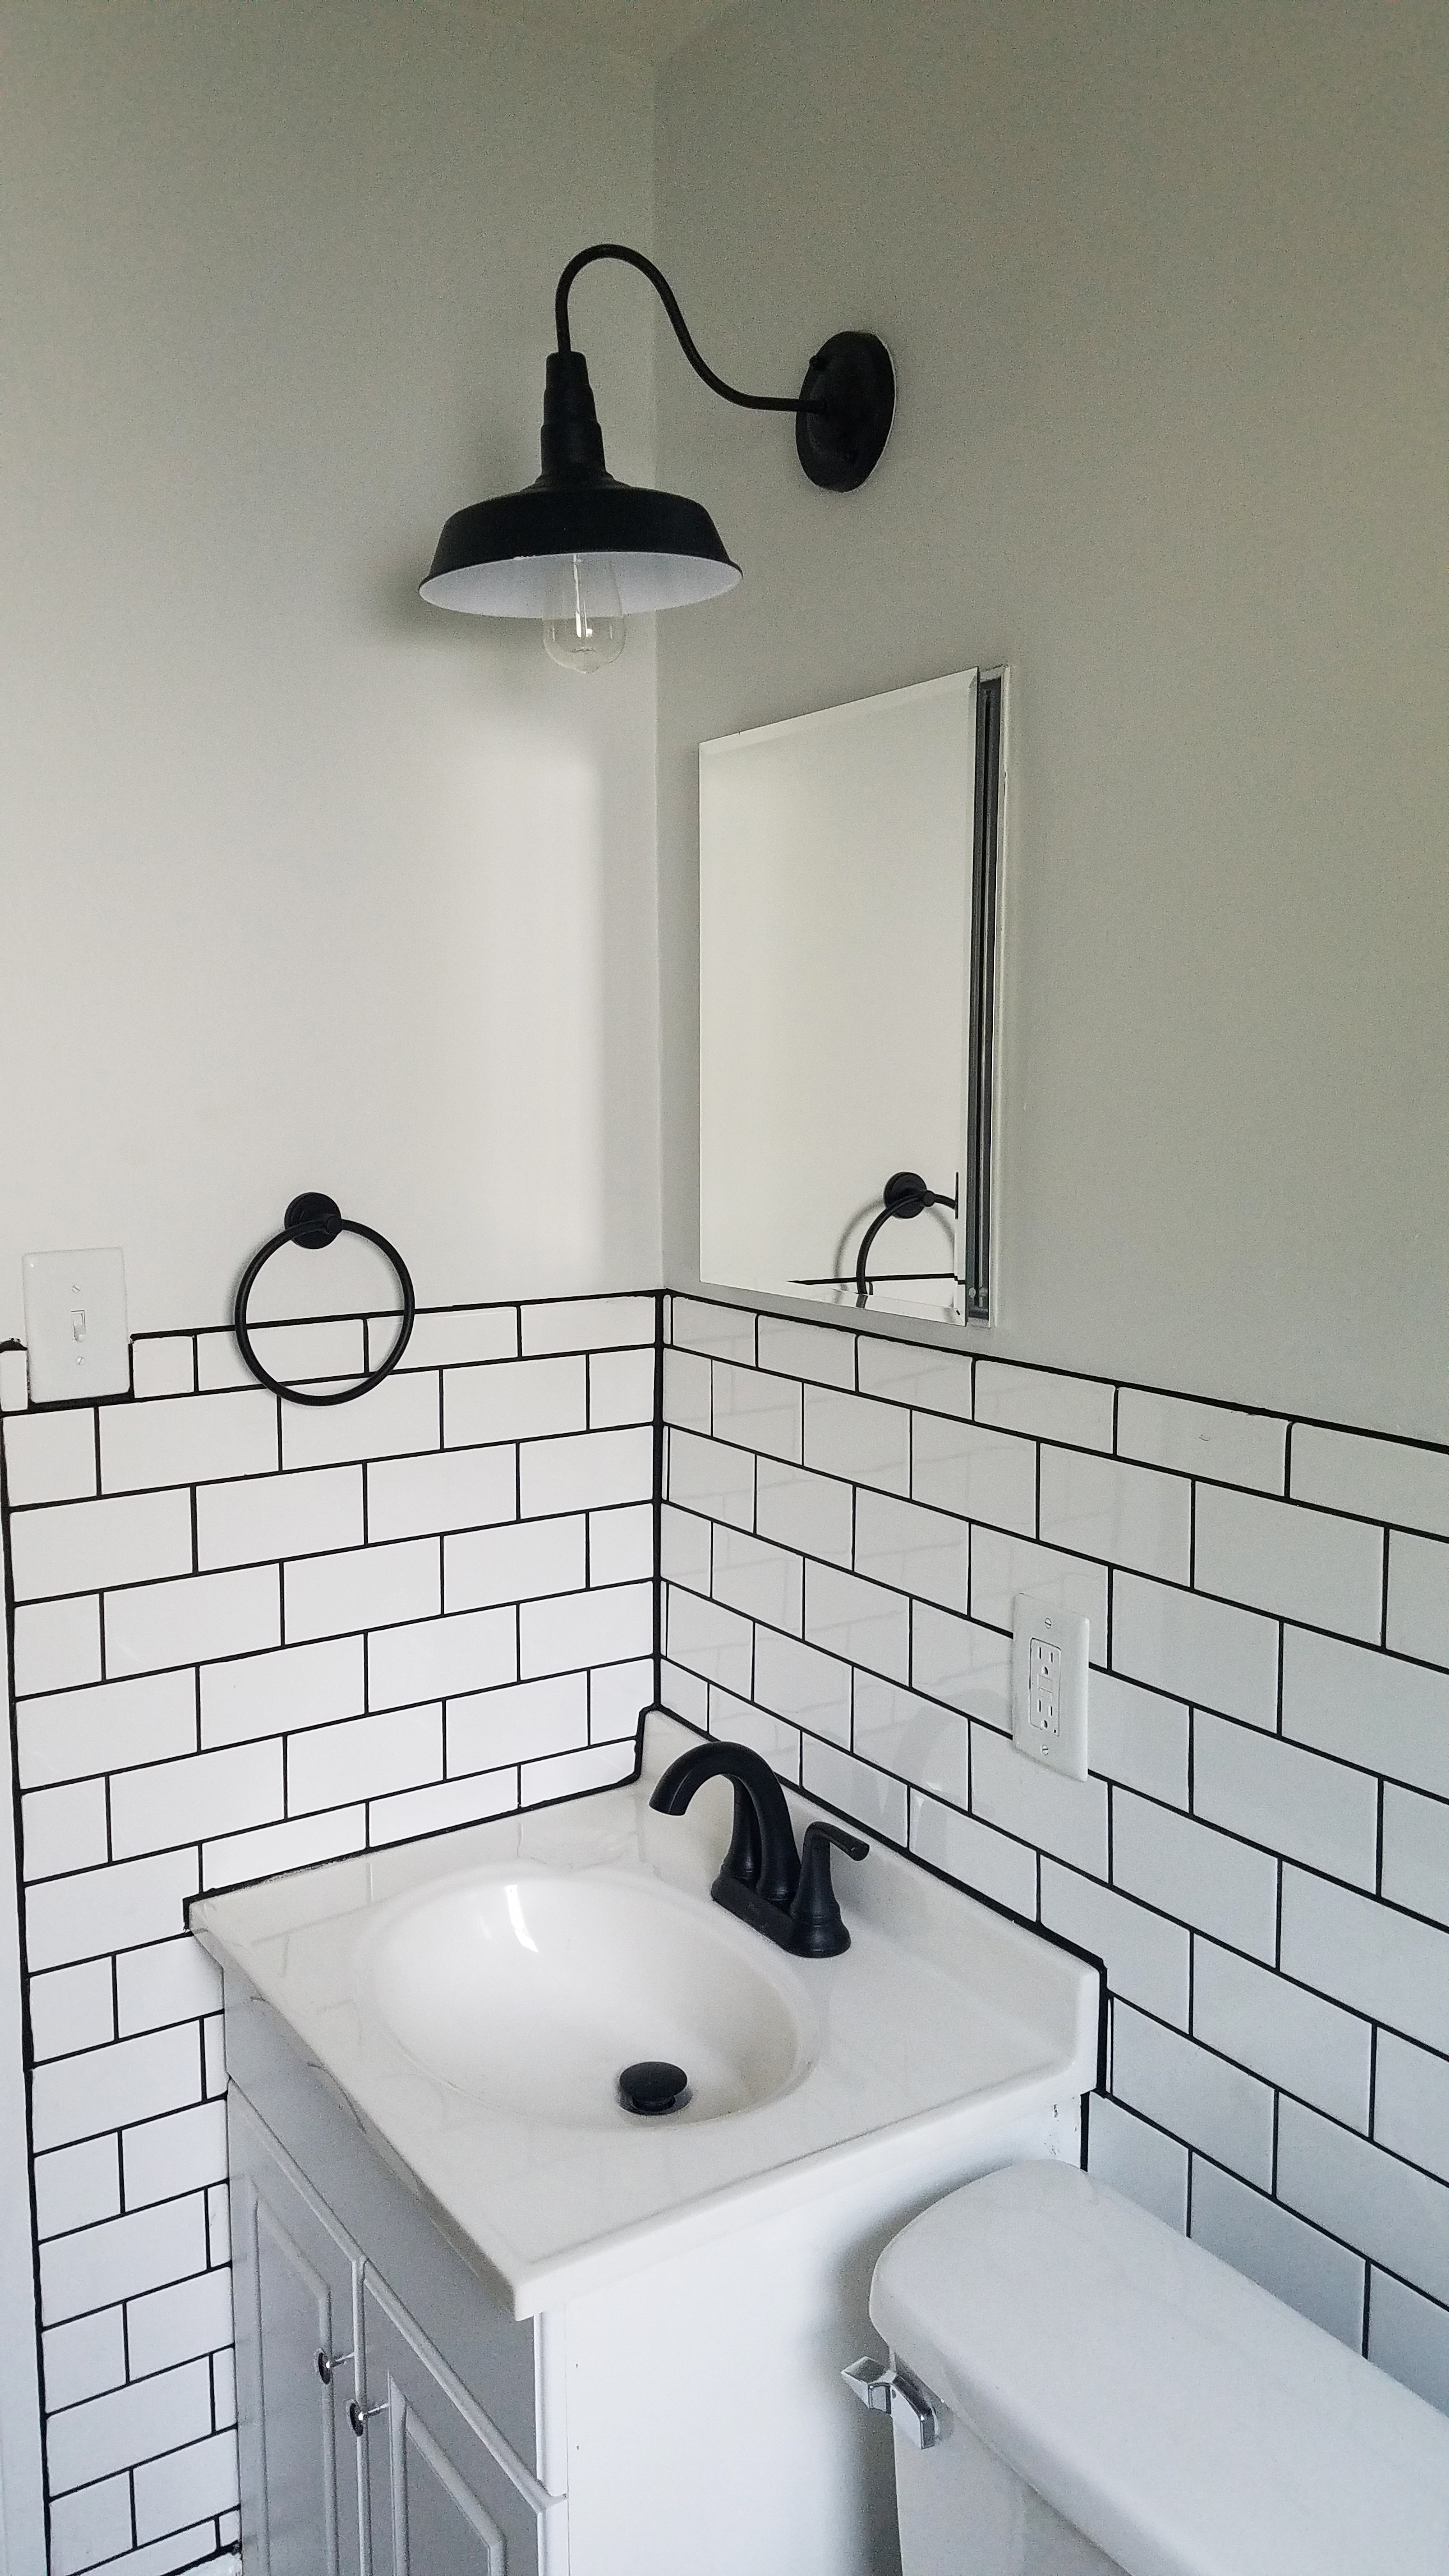 Haymount Homes Glenville House Bathroom sink.jpg